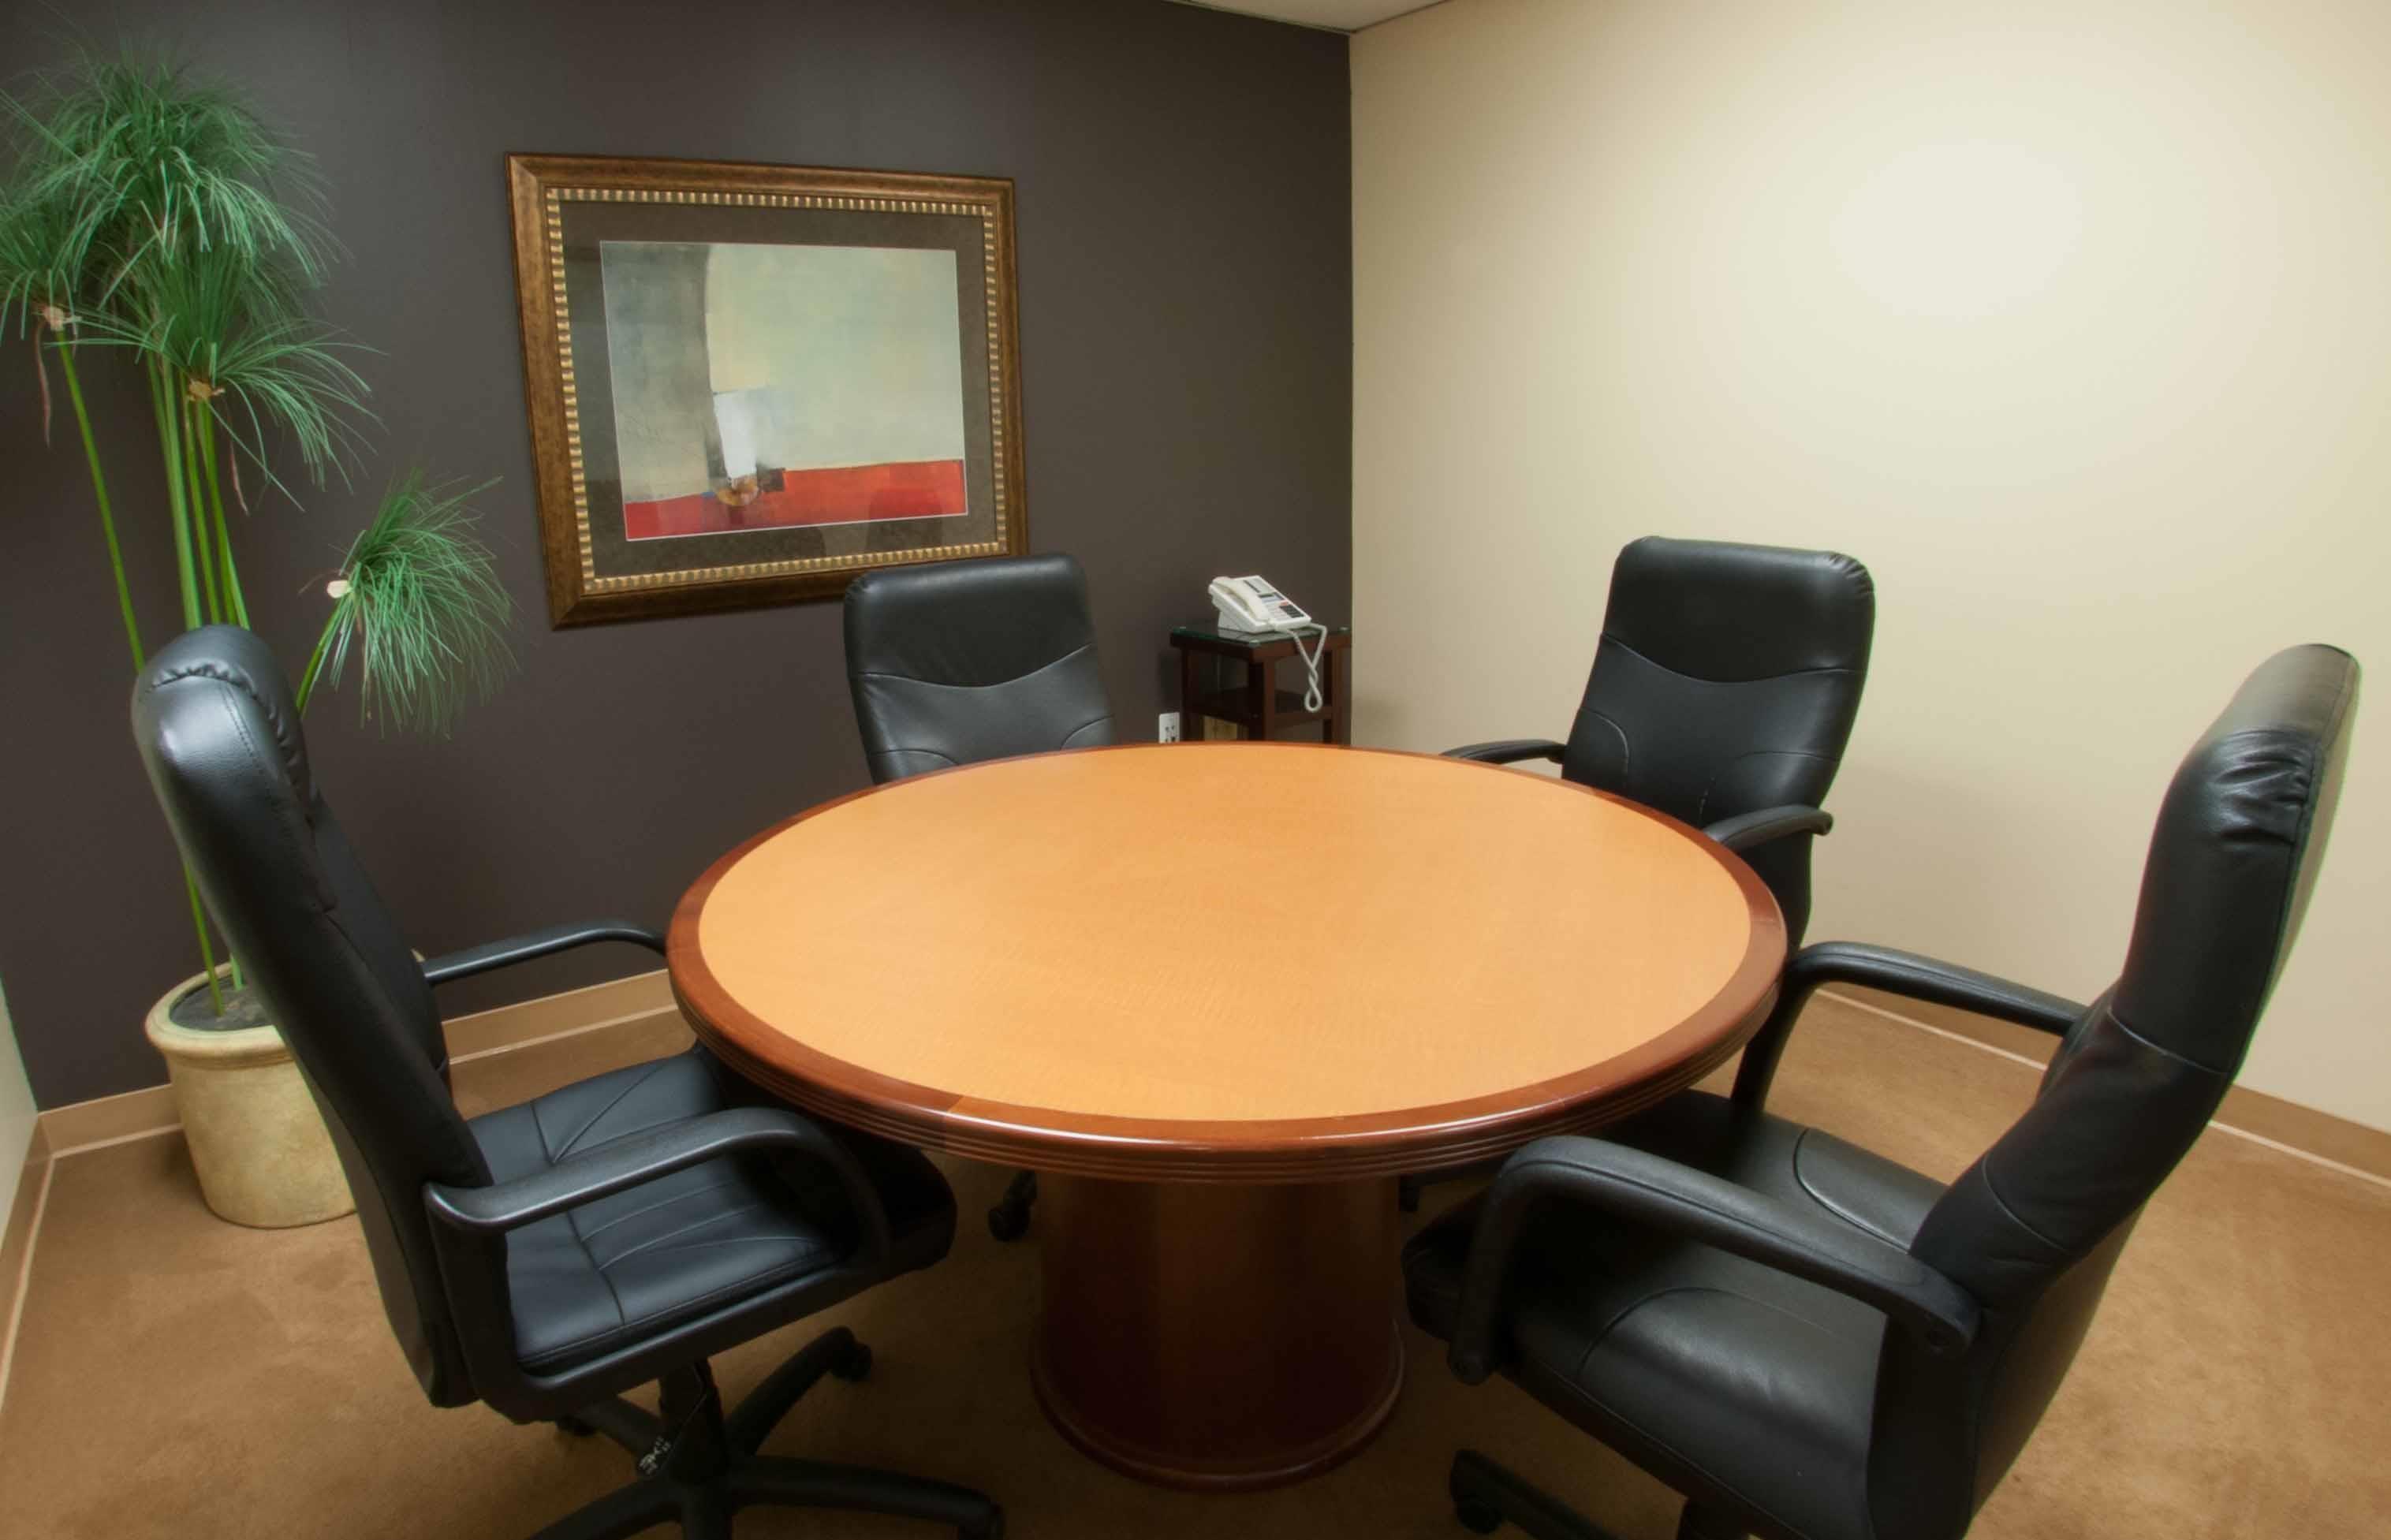 Turnkey La Mirada Conference Room